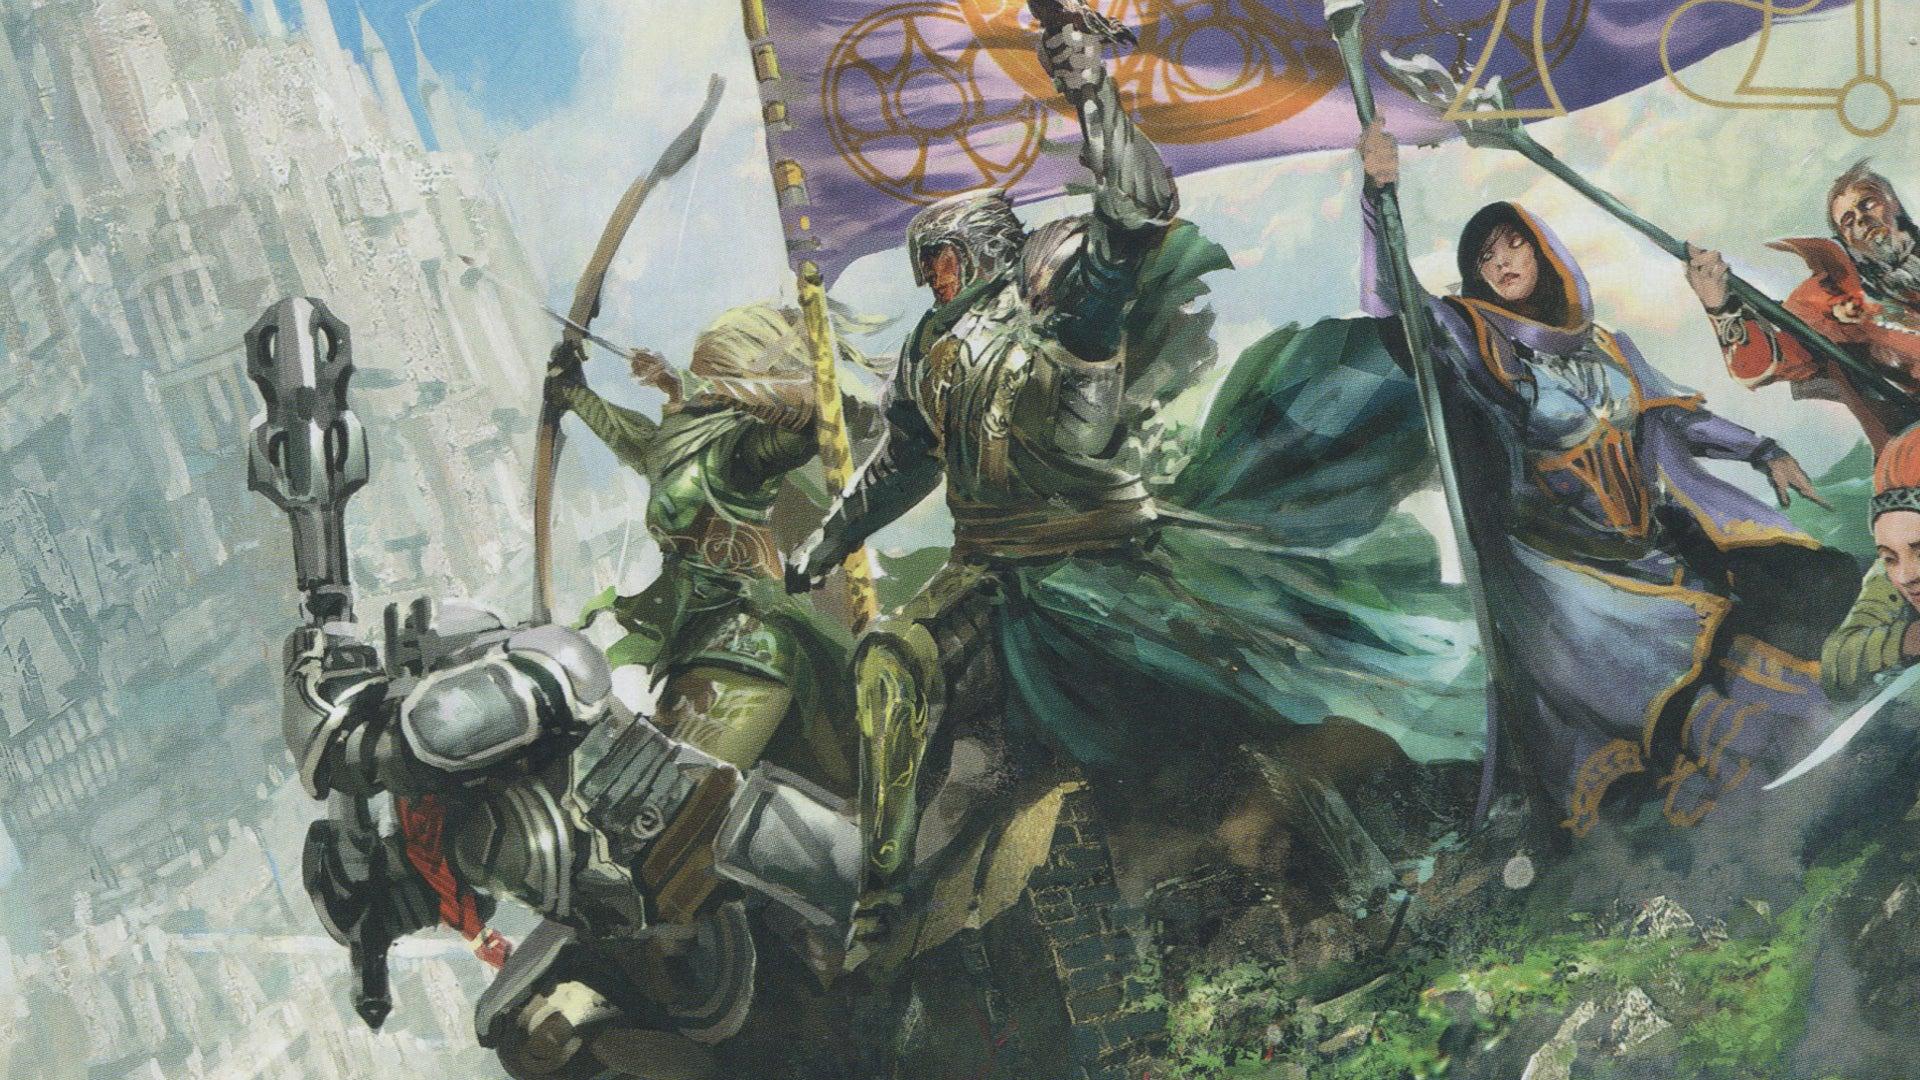 Dungeons & Dragons 5e Players Handbook artwork 1